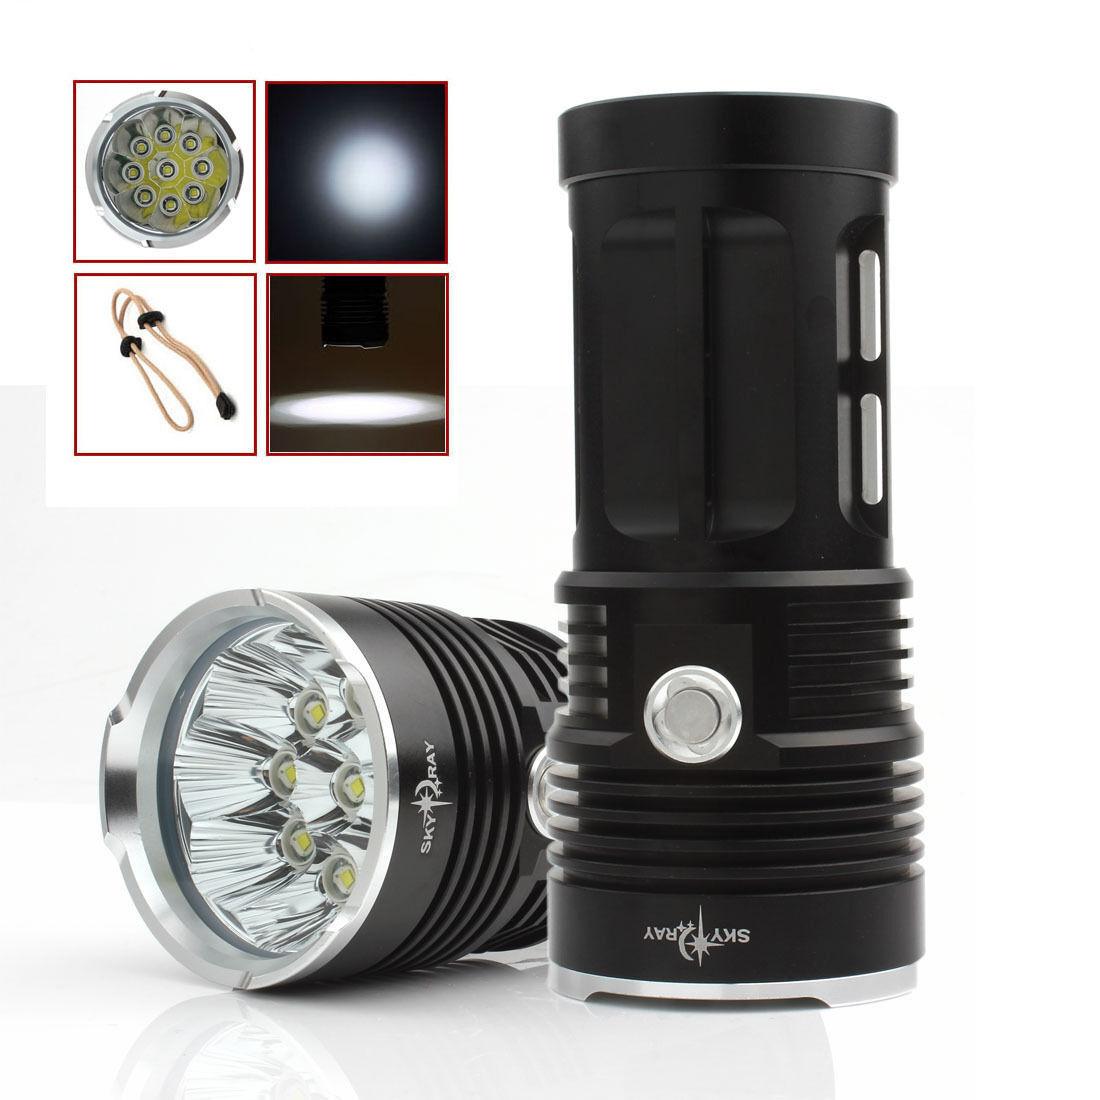 LAMPE TORCHE 9 LED LED LED 22000 LUMENS LED CREE FLASHLIGHT + 4 PILES 18650 + CHARGEUR 3bda60